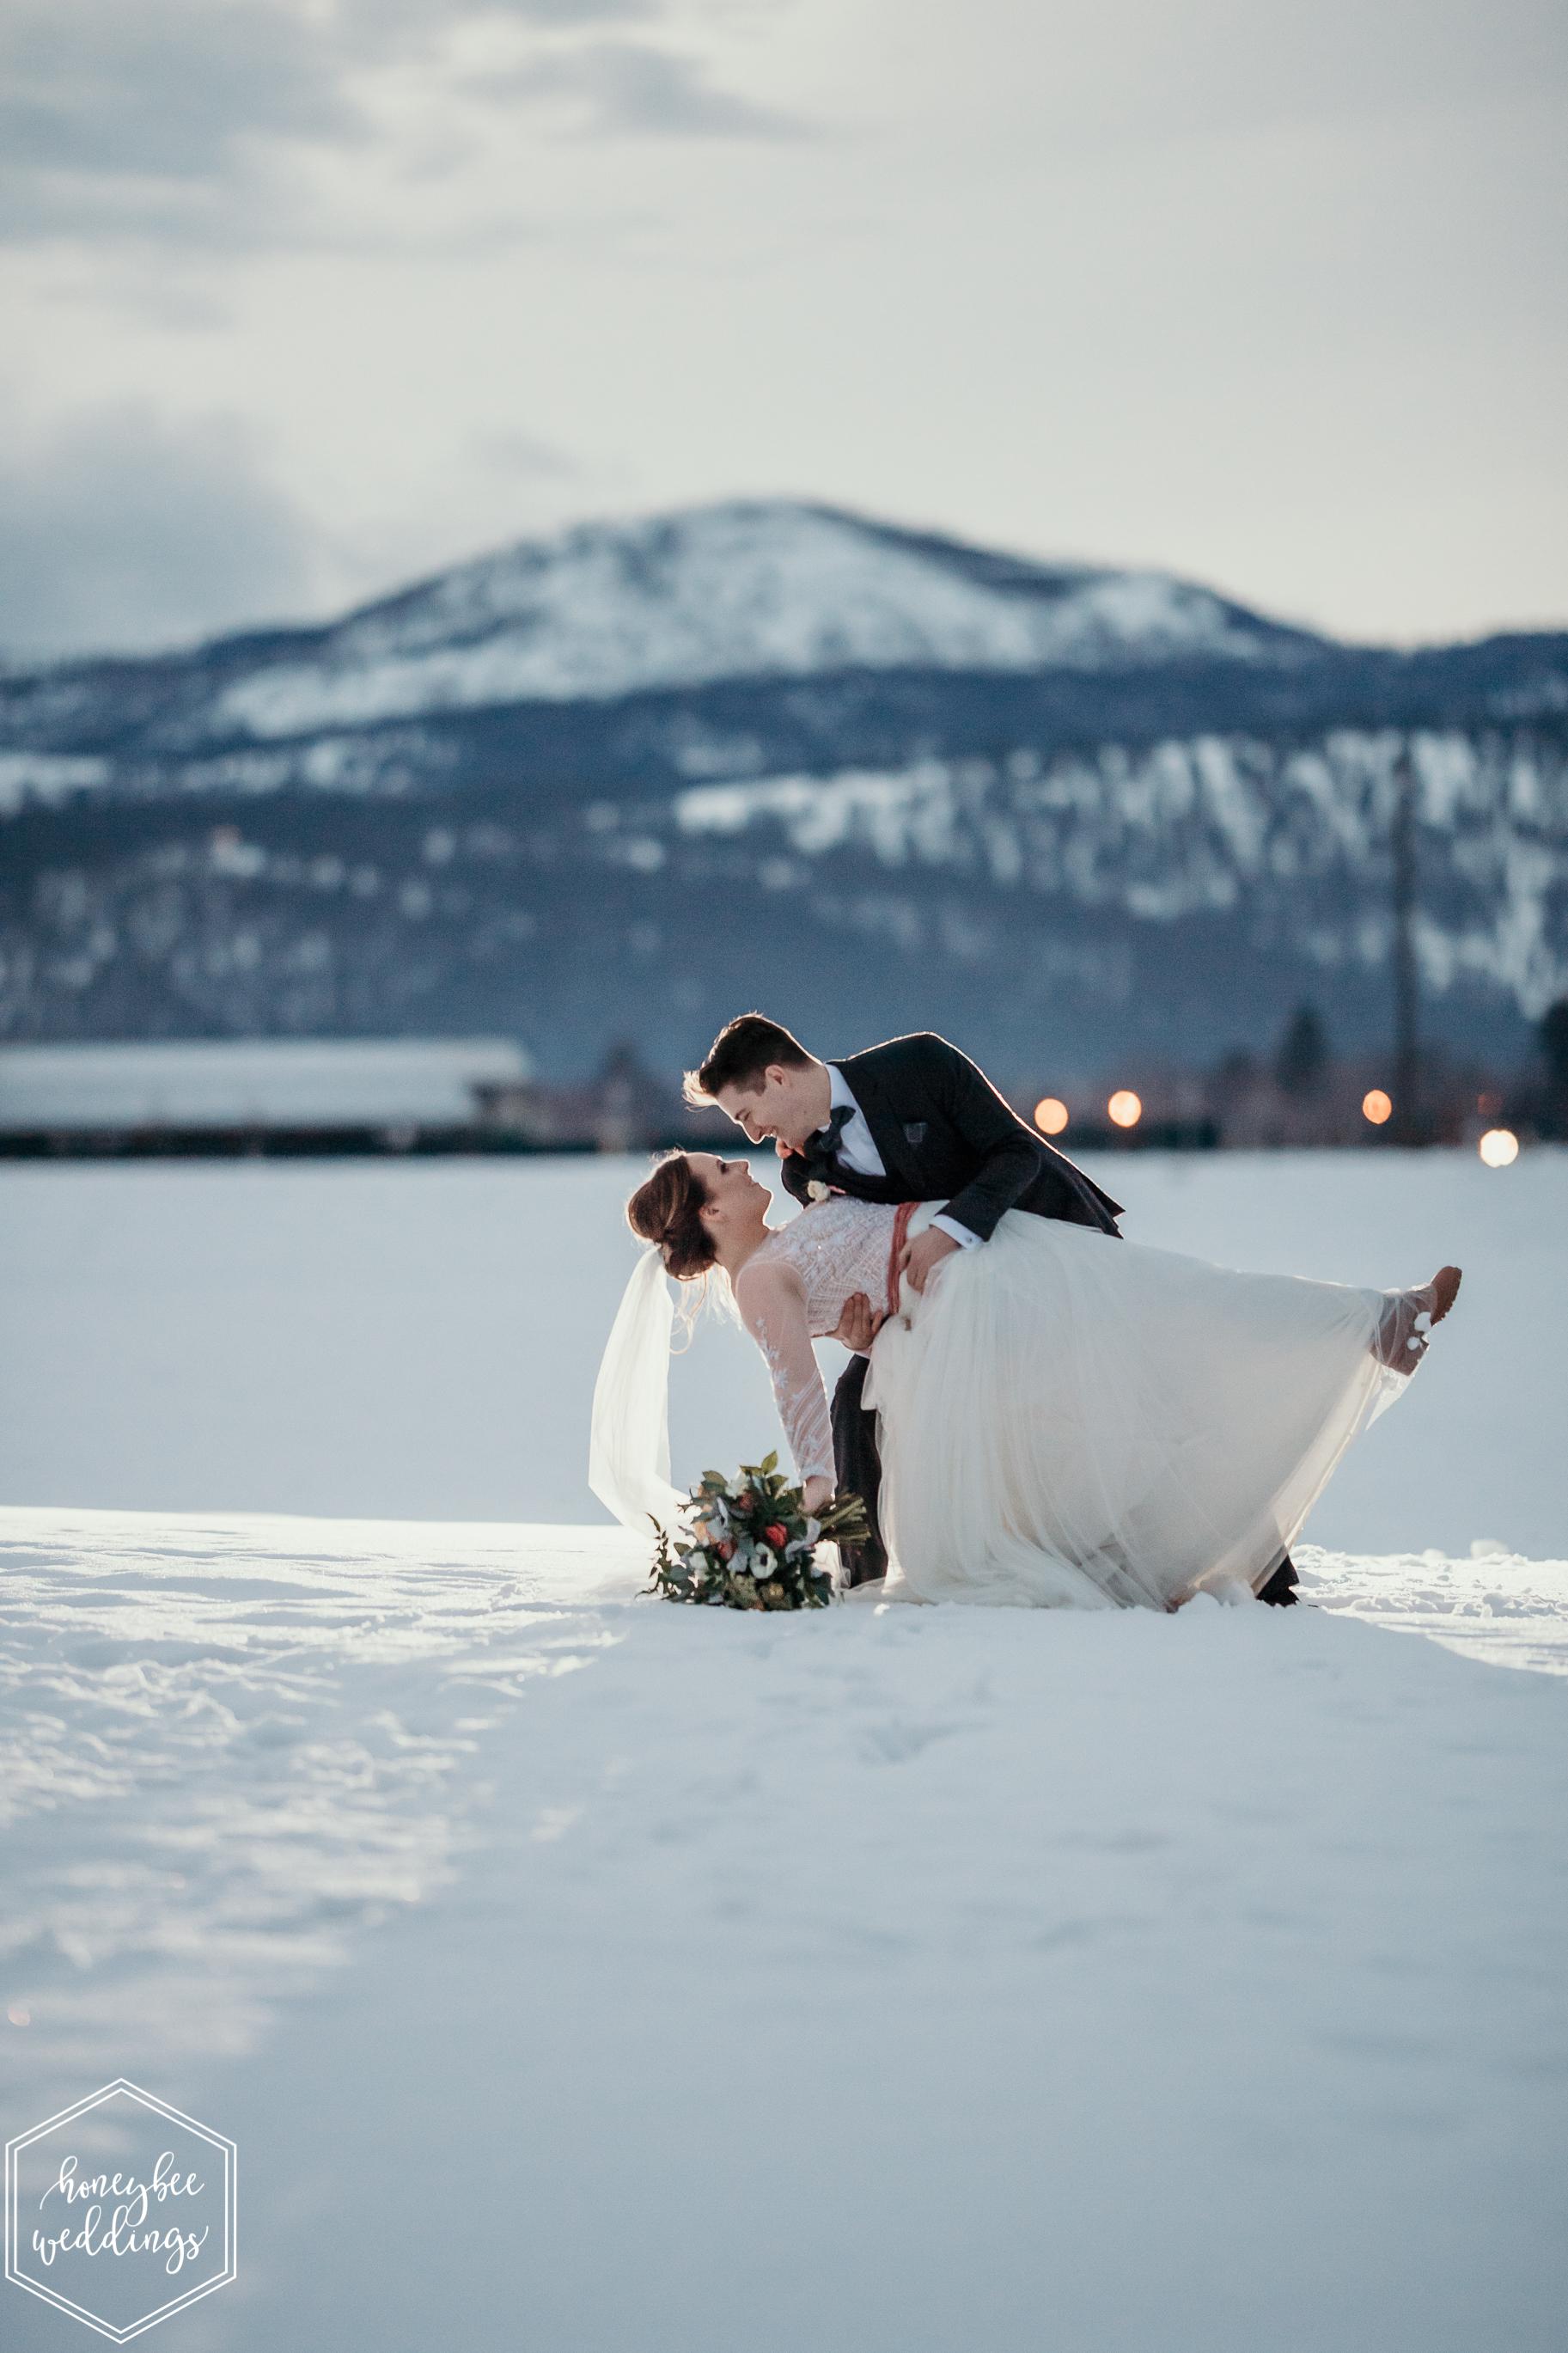 0271Montana Wedding Photographer_Montana winter wedding_Wedding at Fort Missoula_Meri & Carter_December 31, 2015-22.jpg